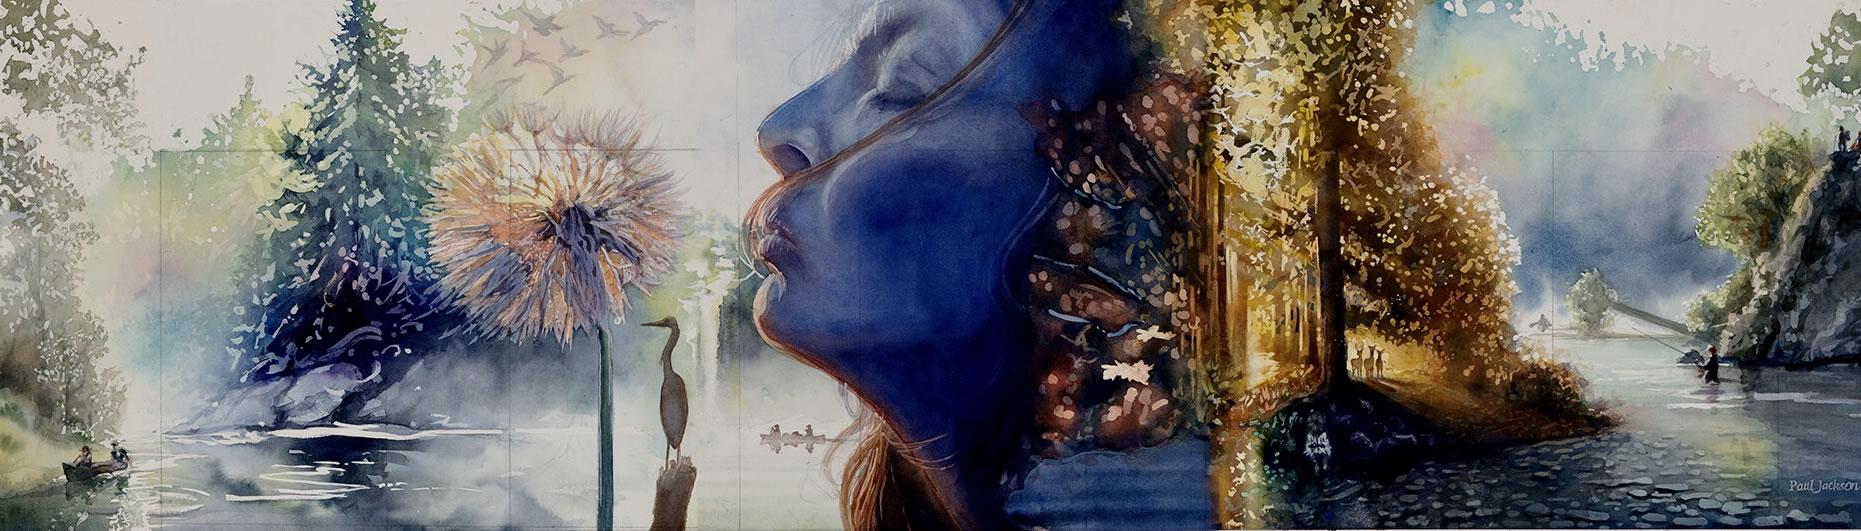 River Dreams by Paul Jackson